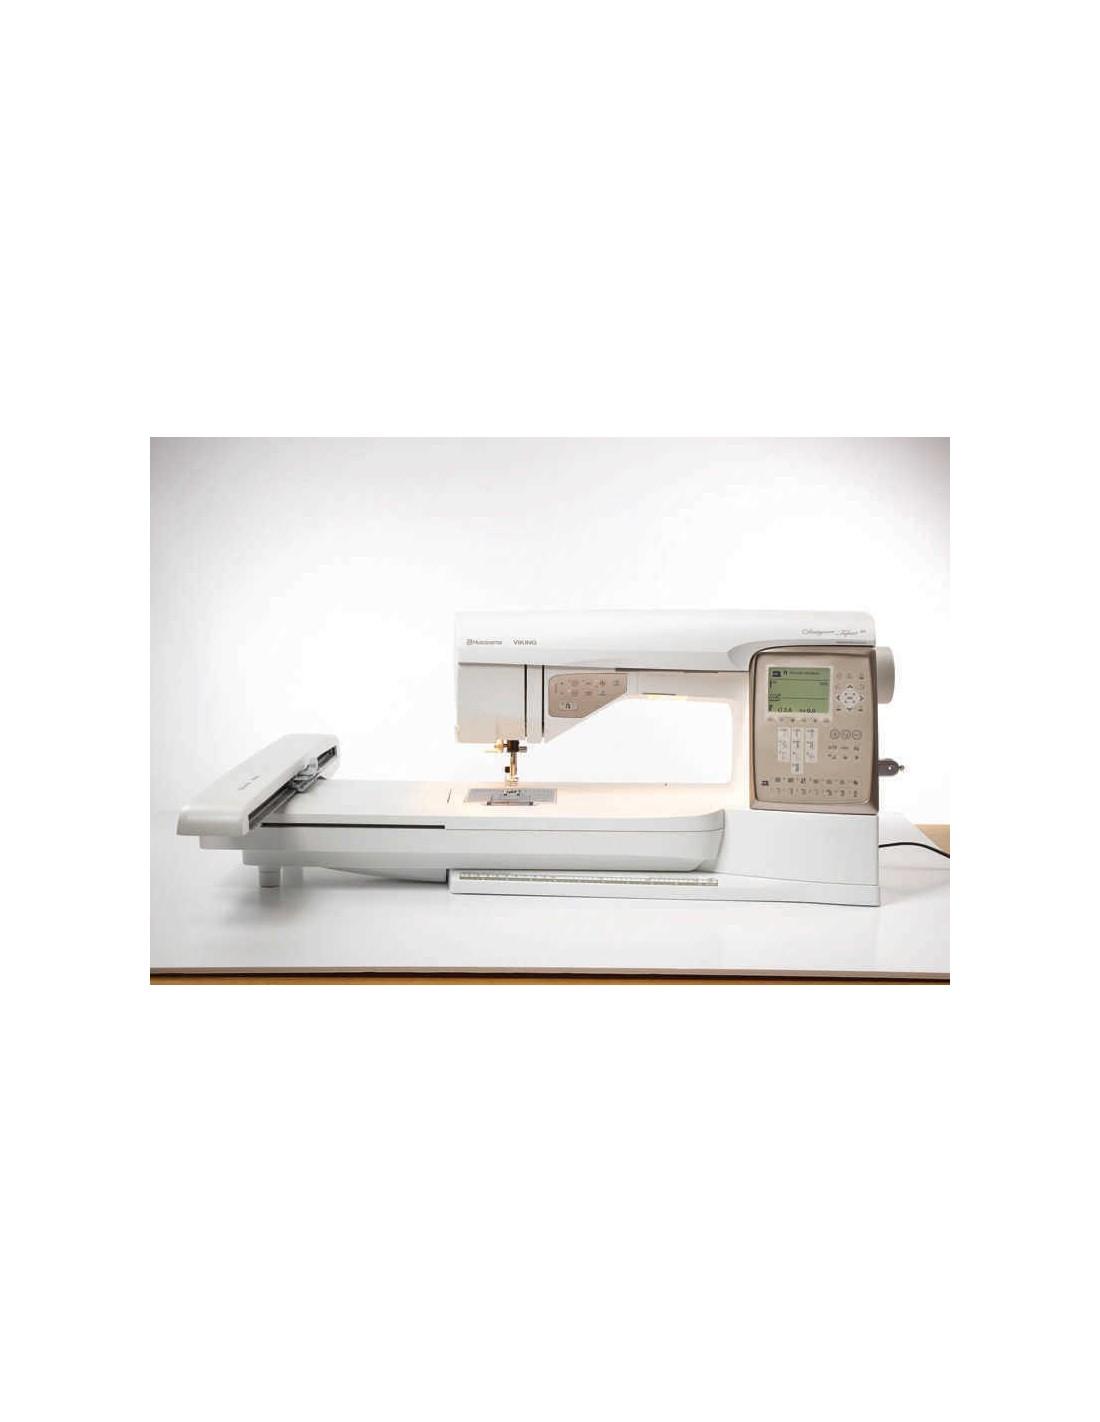 Husqvarna-Viking Designer Topaz 30 Sewing and Embroidery ...